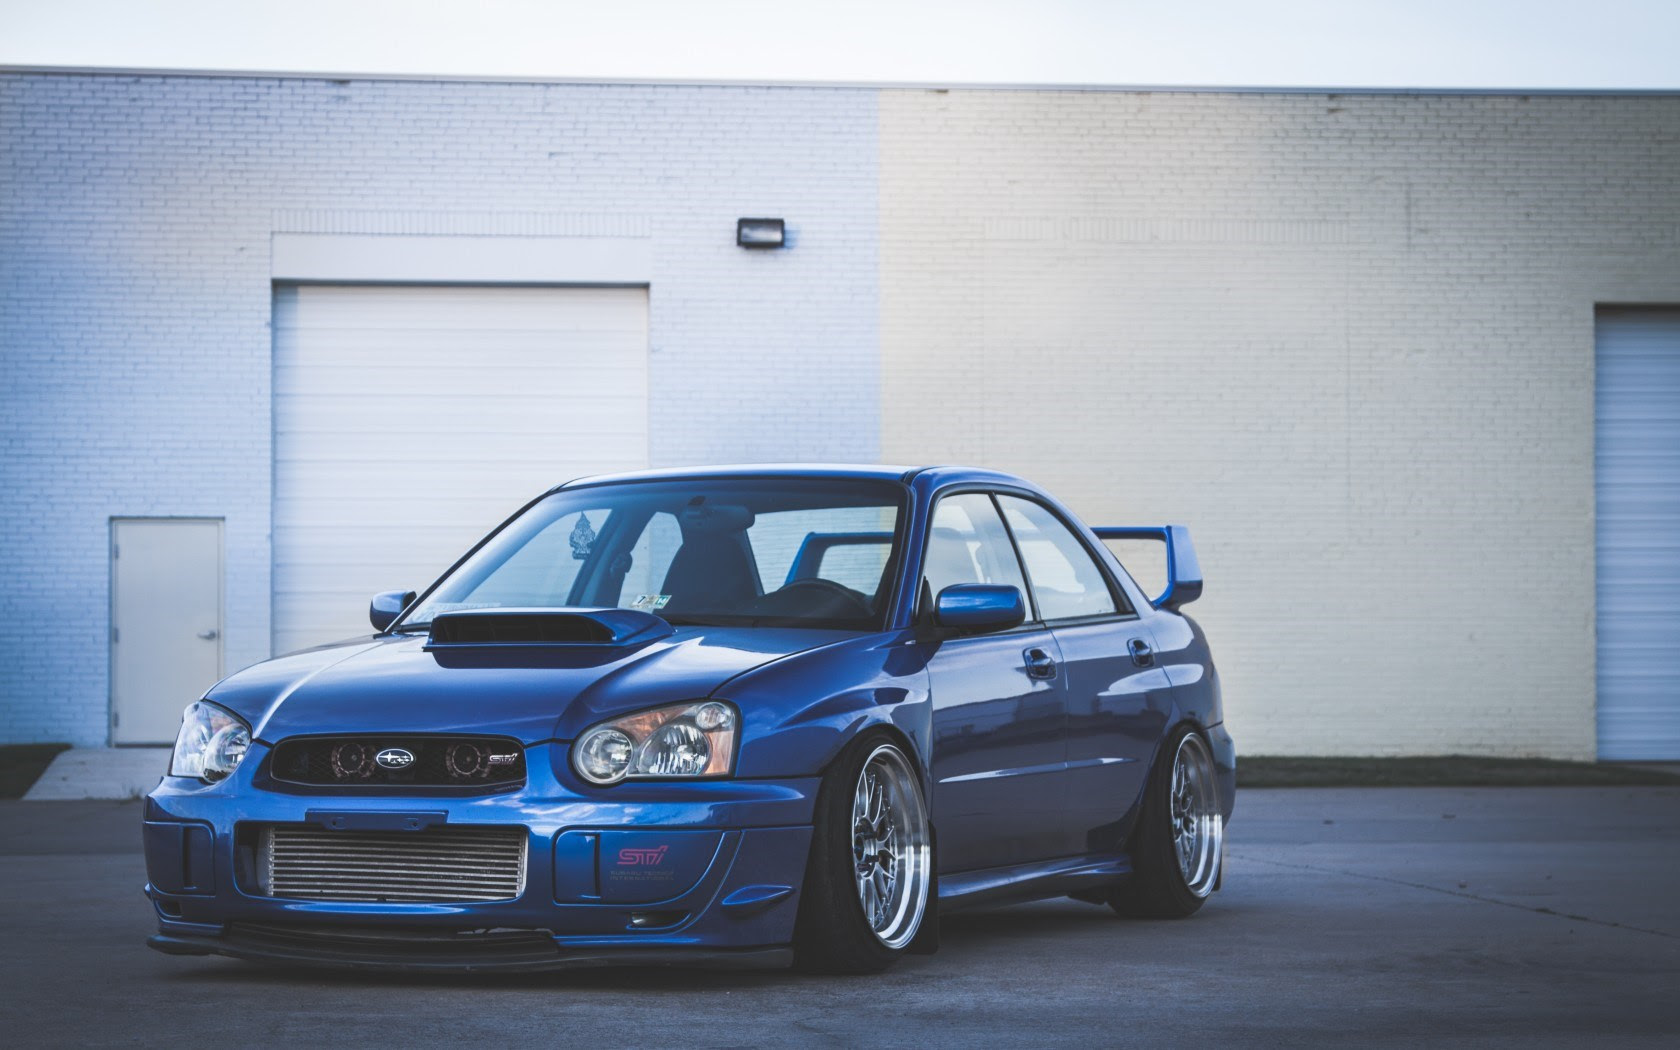 Blue Subaru Impreza Wrx Sti Hd Wallpaper Opera Wallpapers